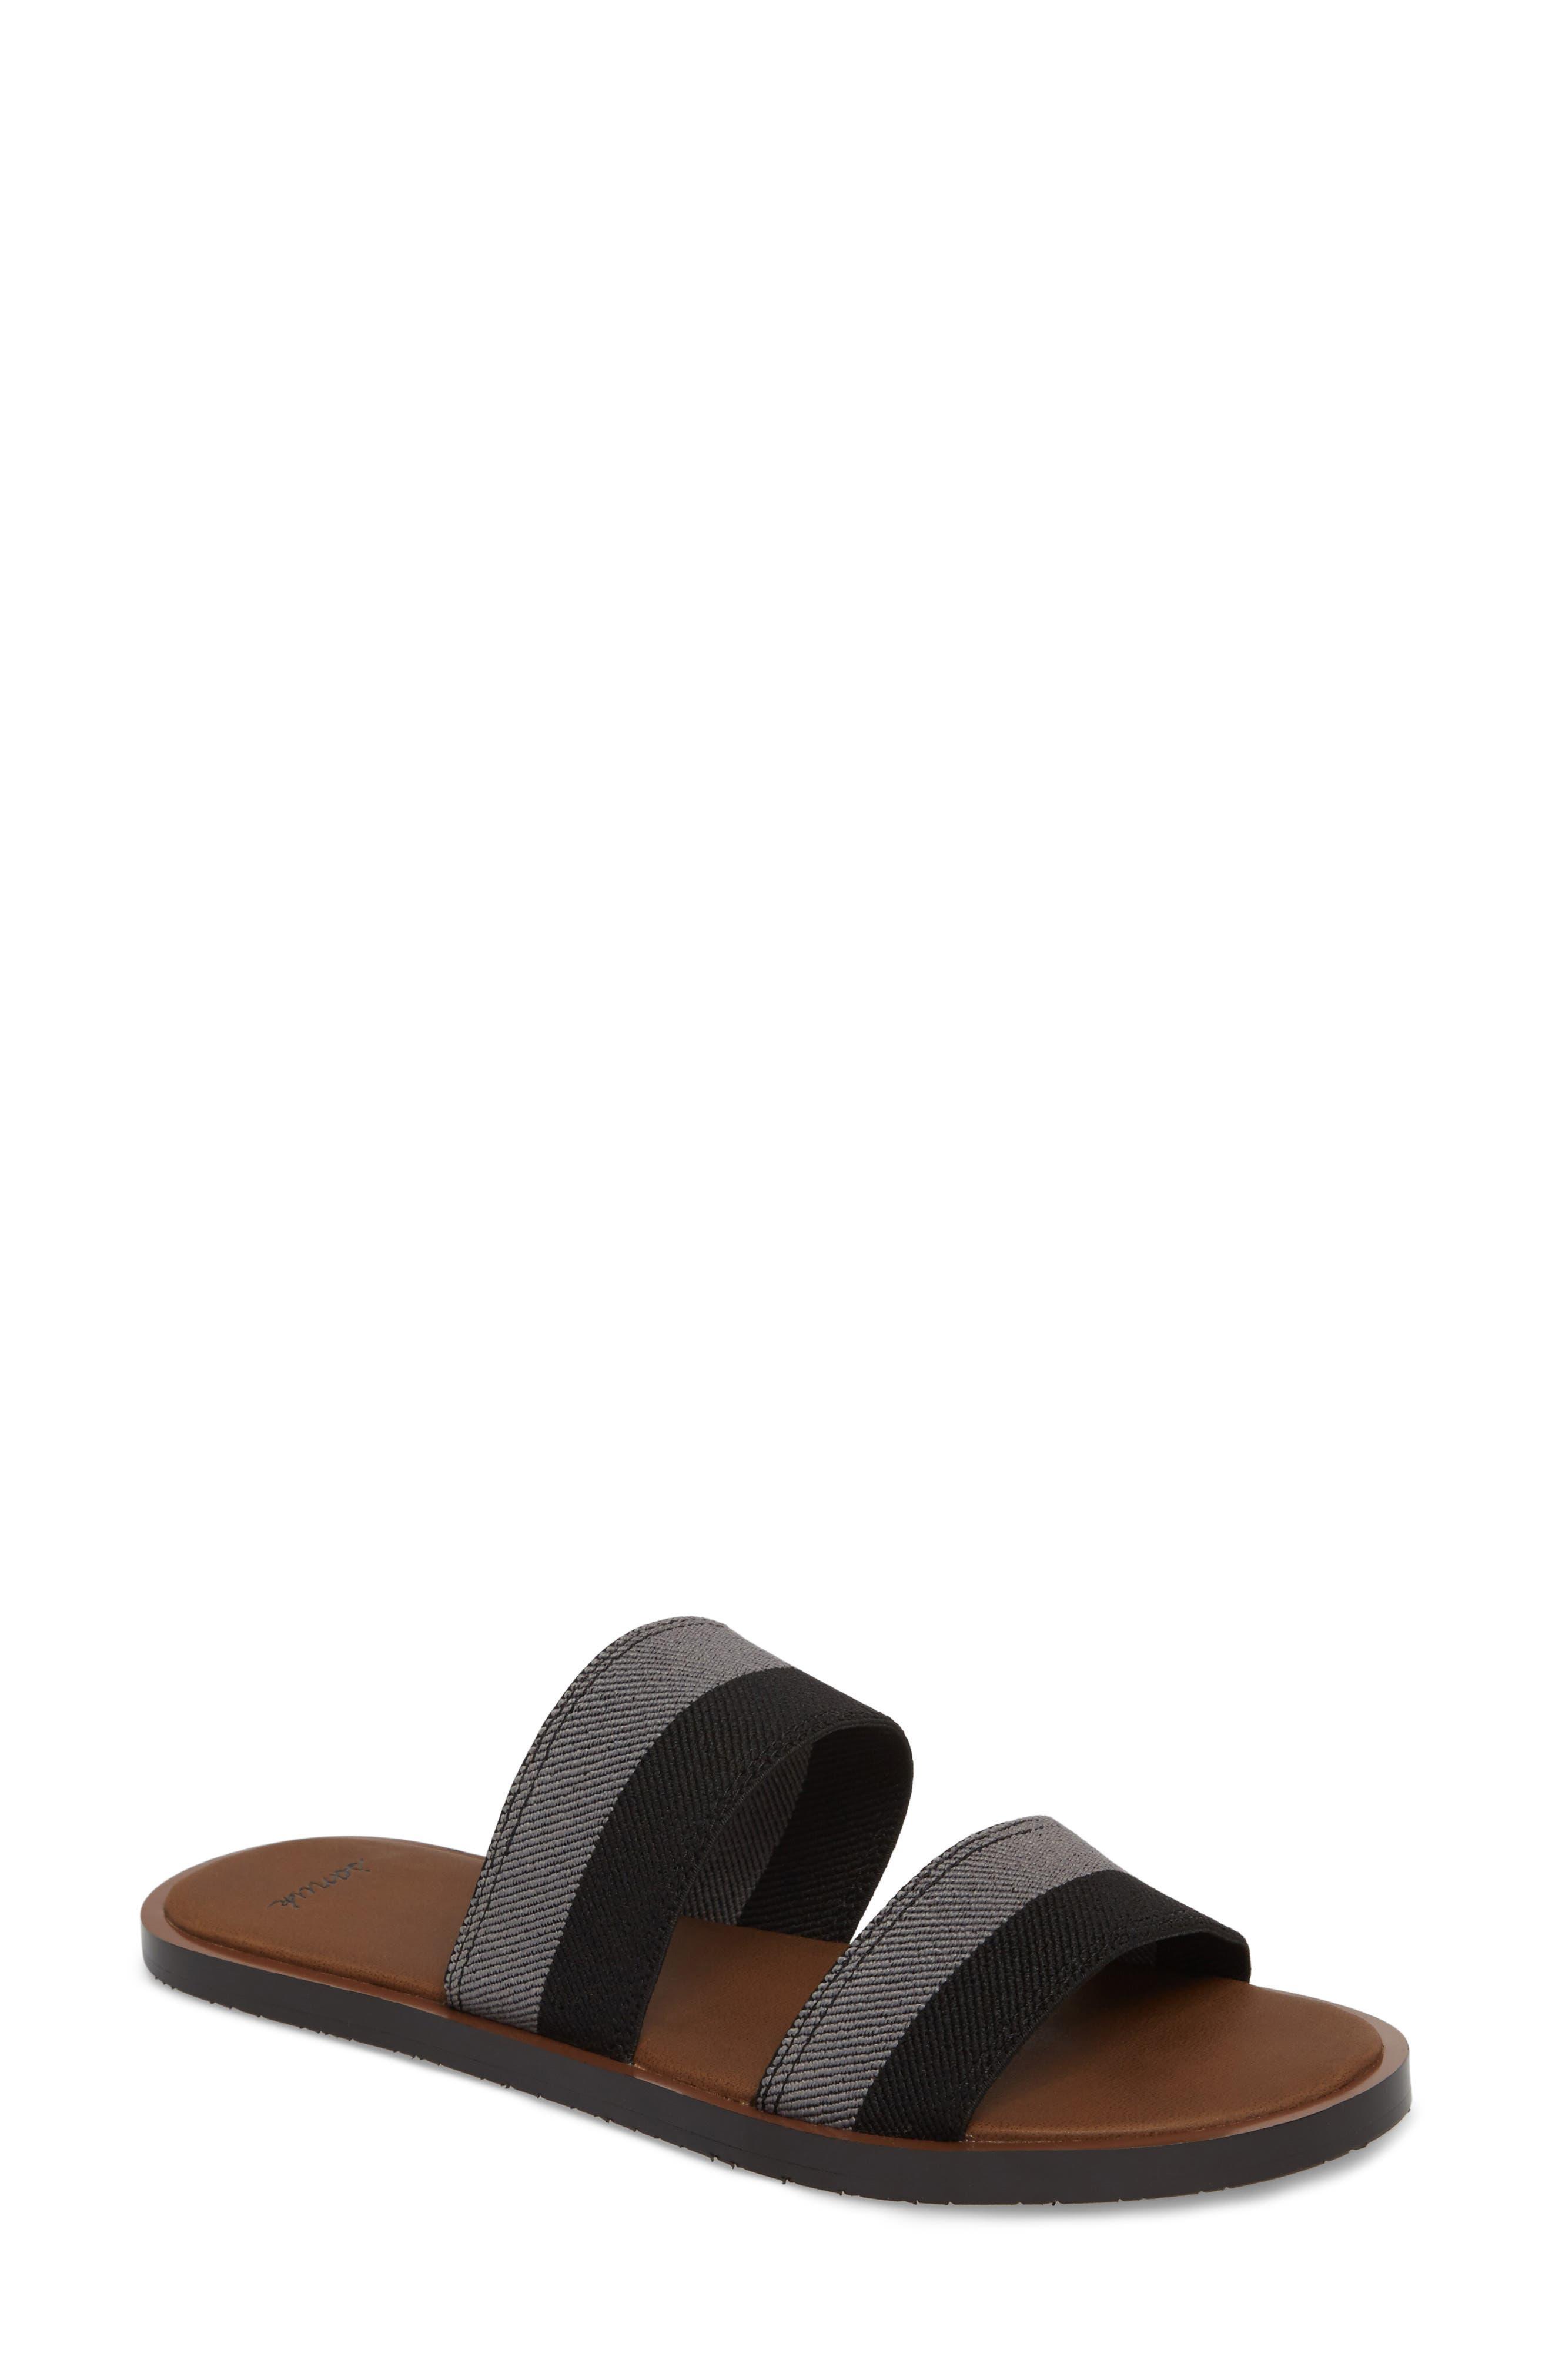 Yoga Gora Gora Slide Sandal,                         Main,                         color, BLACK/ CHARCOAL